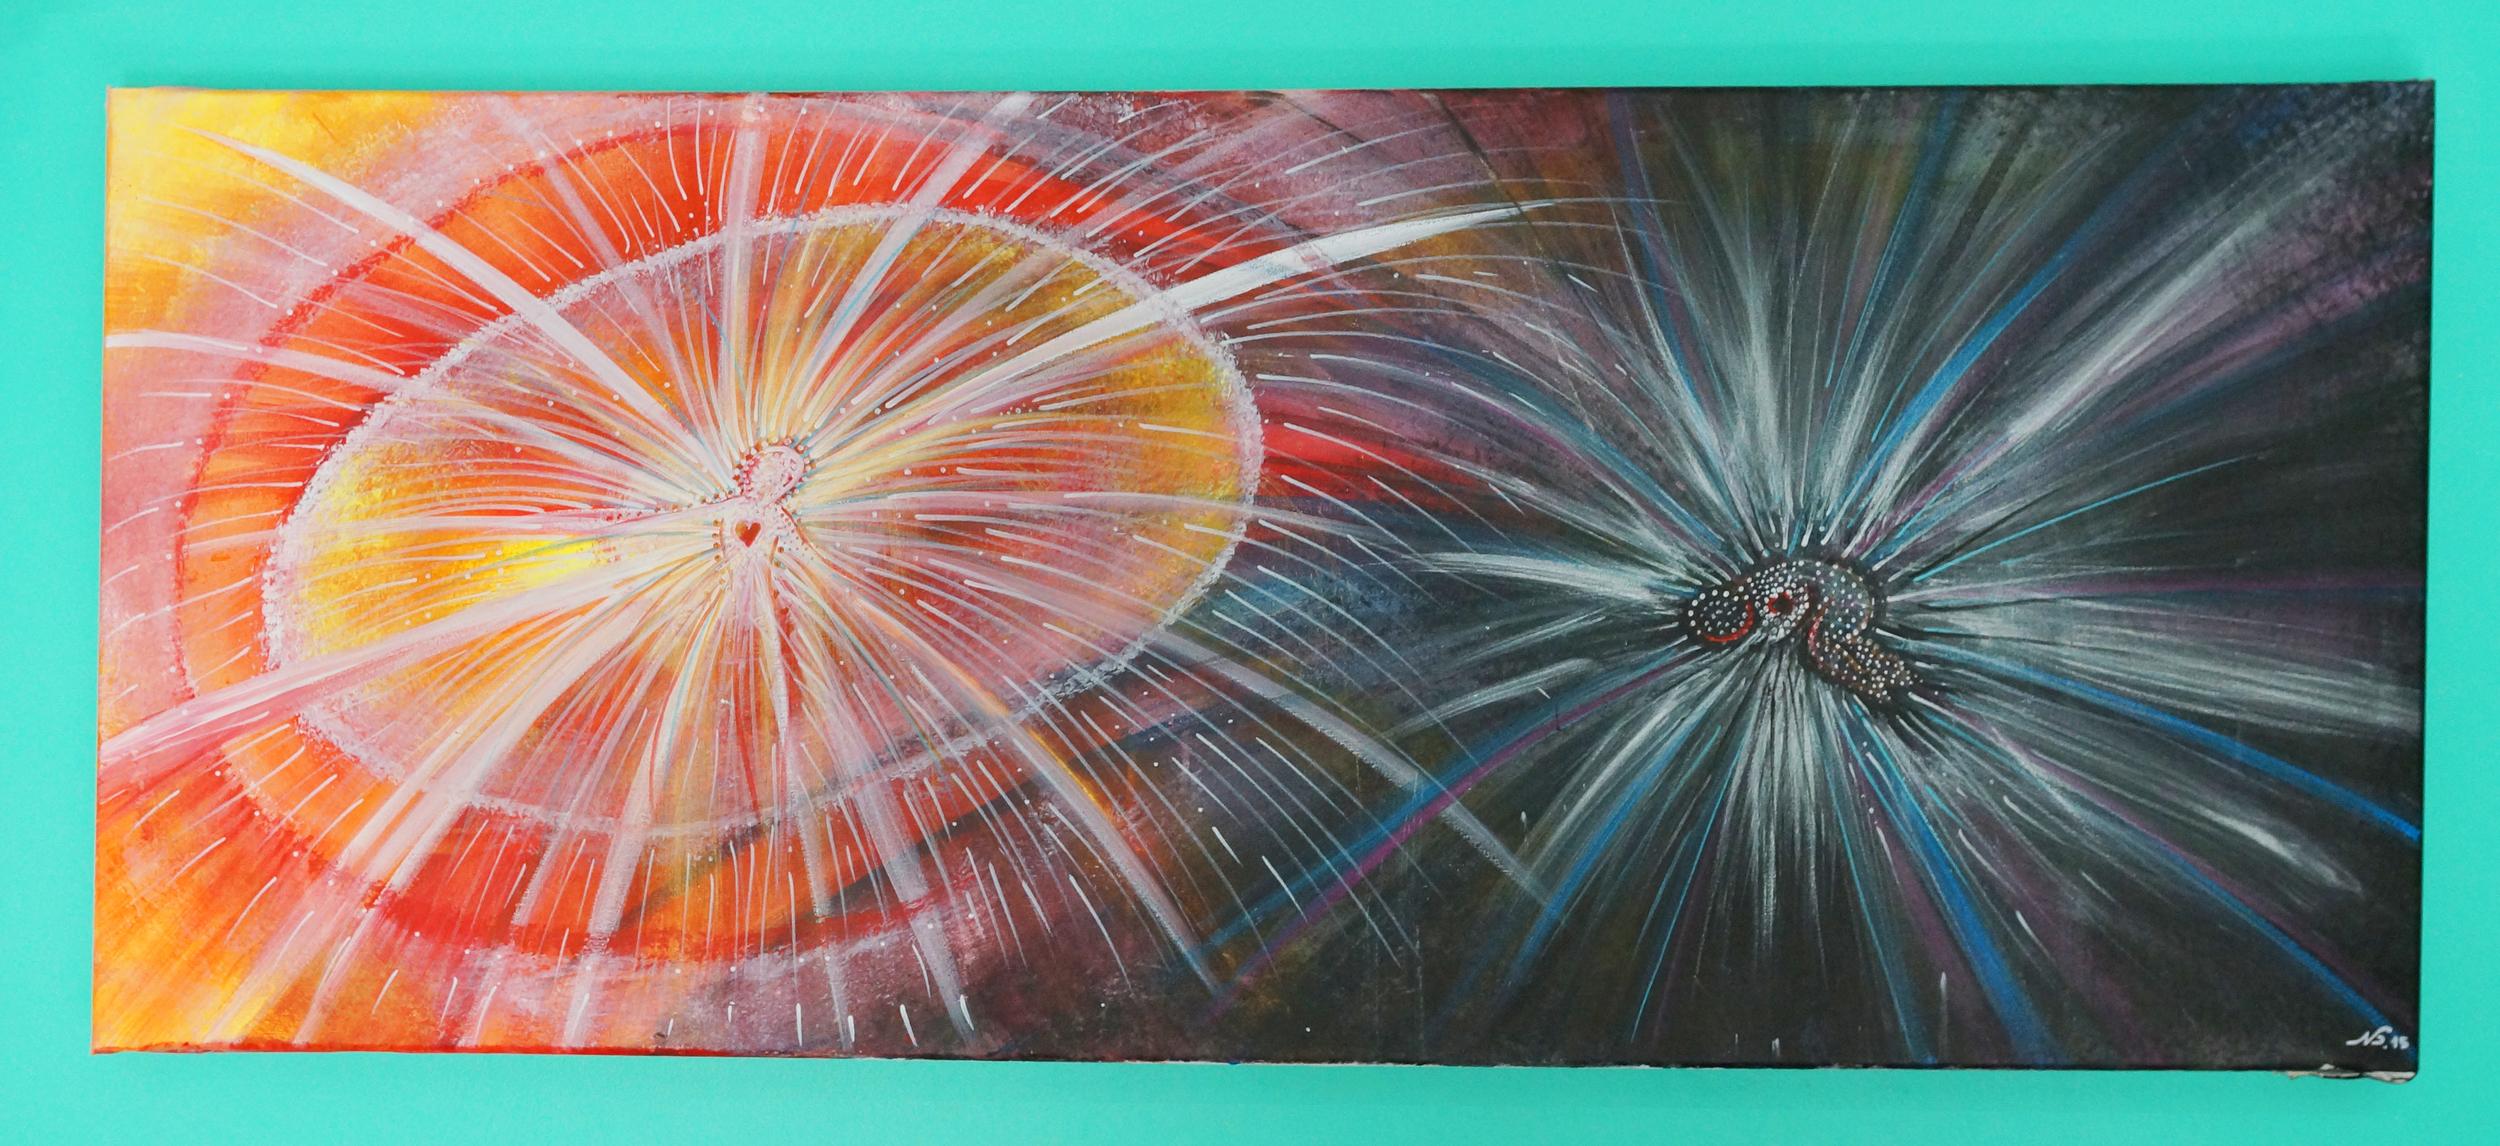 2ft x 4.5ft Acrylic on canvas